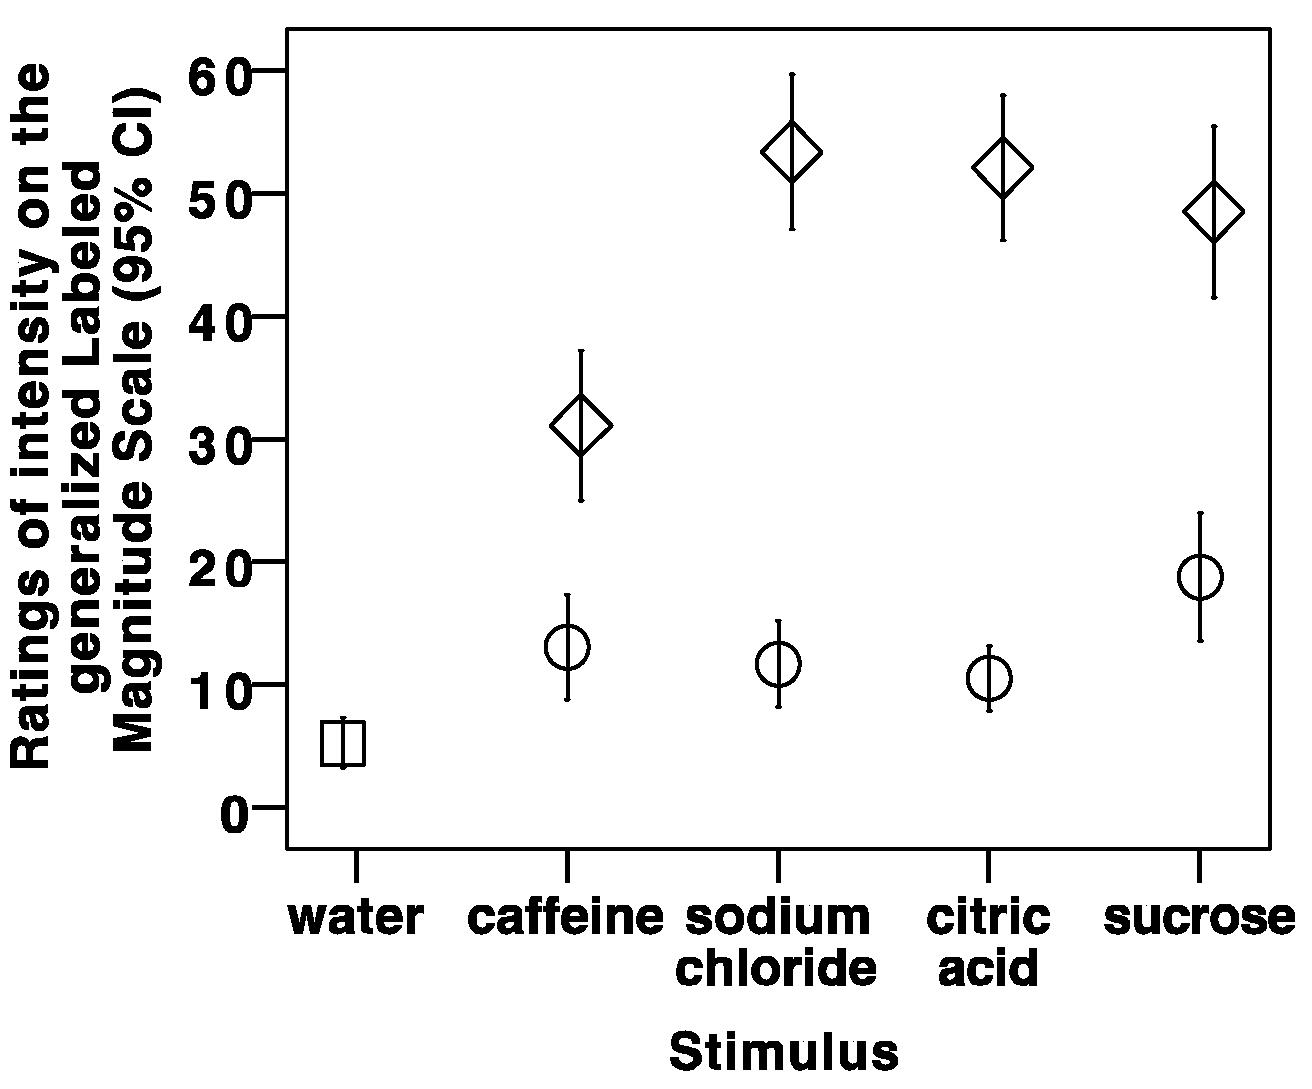 Geriatrics Free Full Text Taste Perception And Water Swallow Salt Taster Circuit Diagram 03 00083 G001